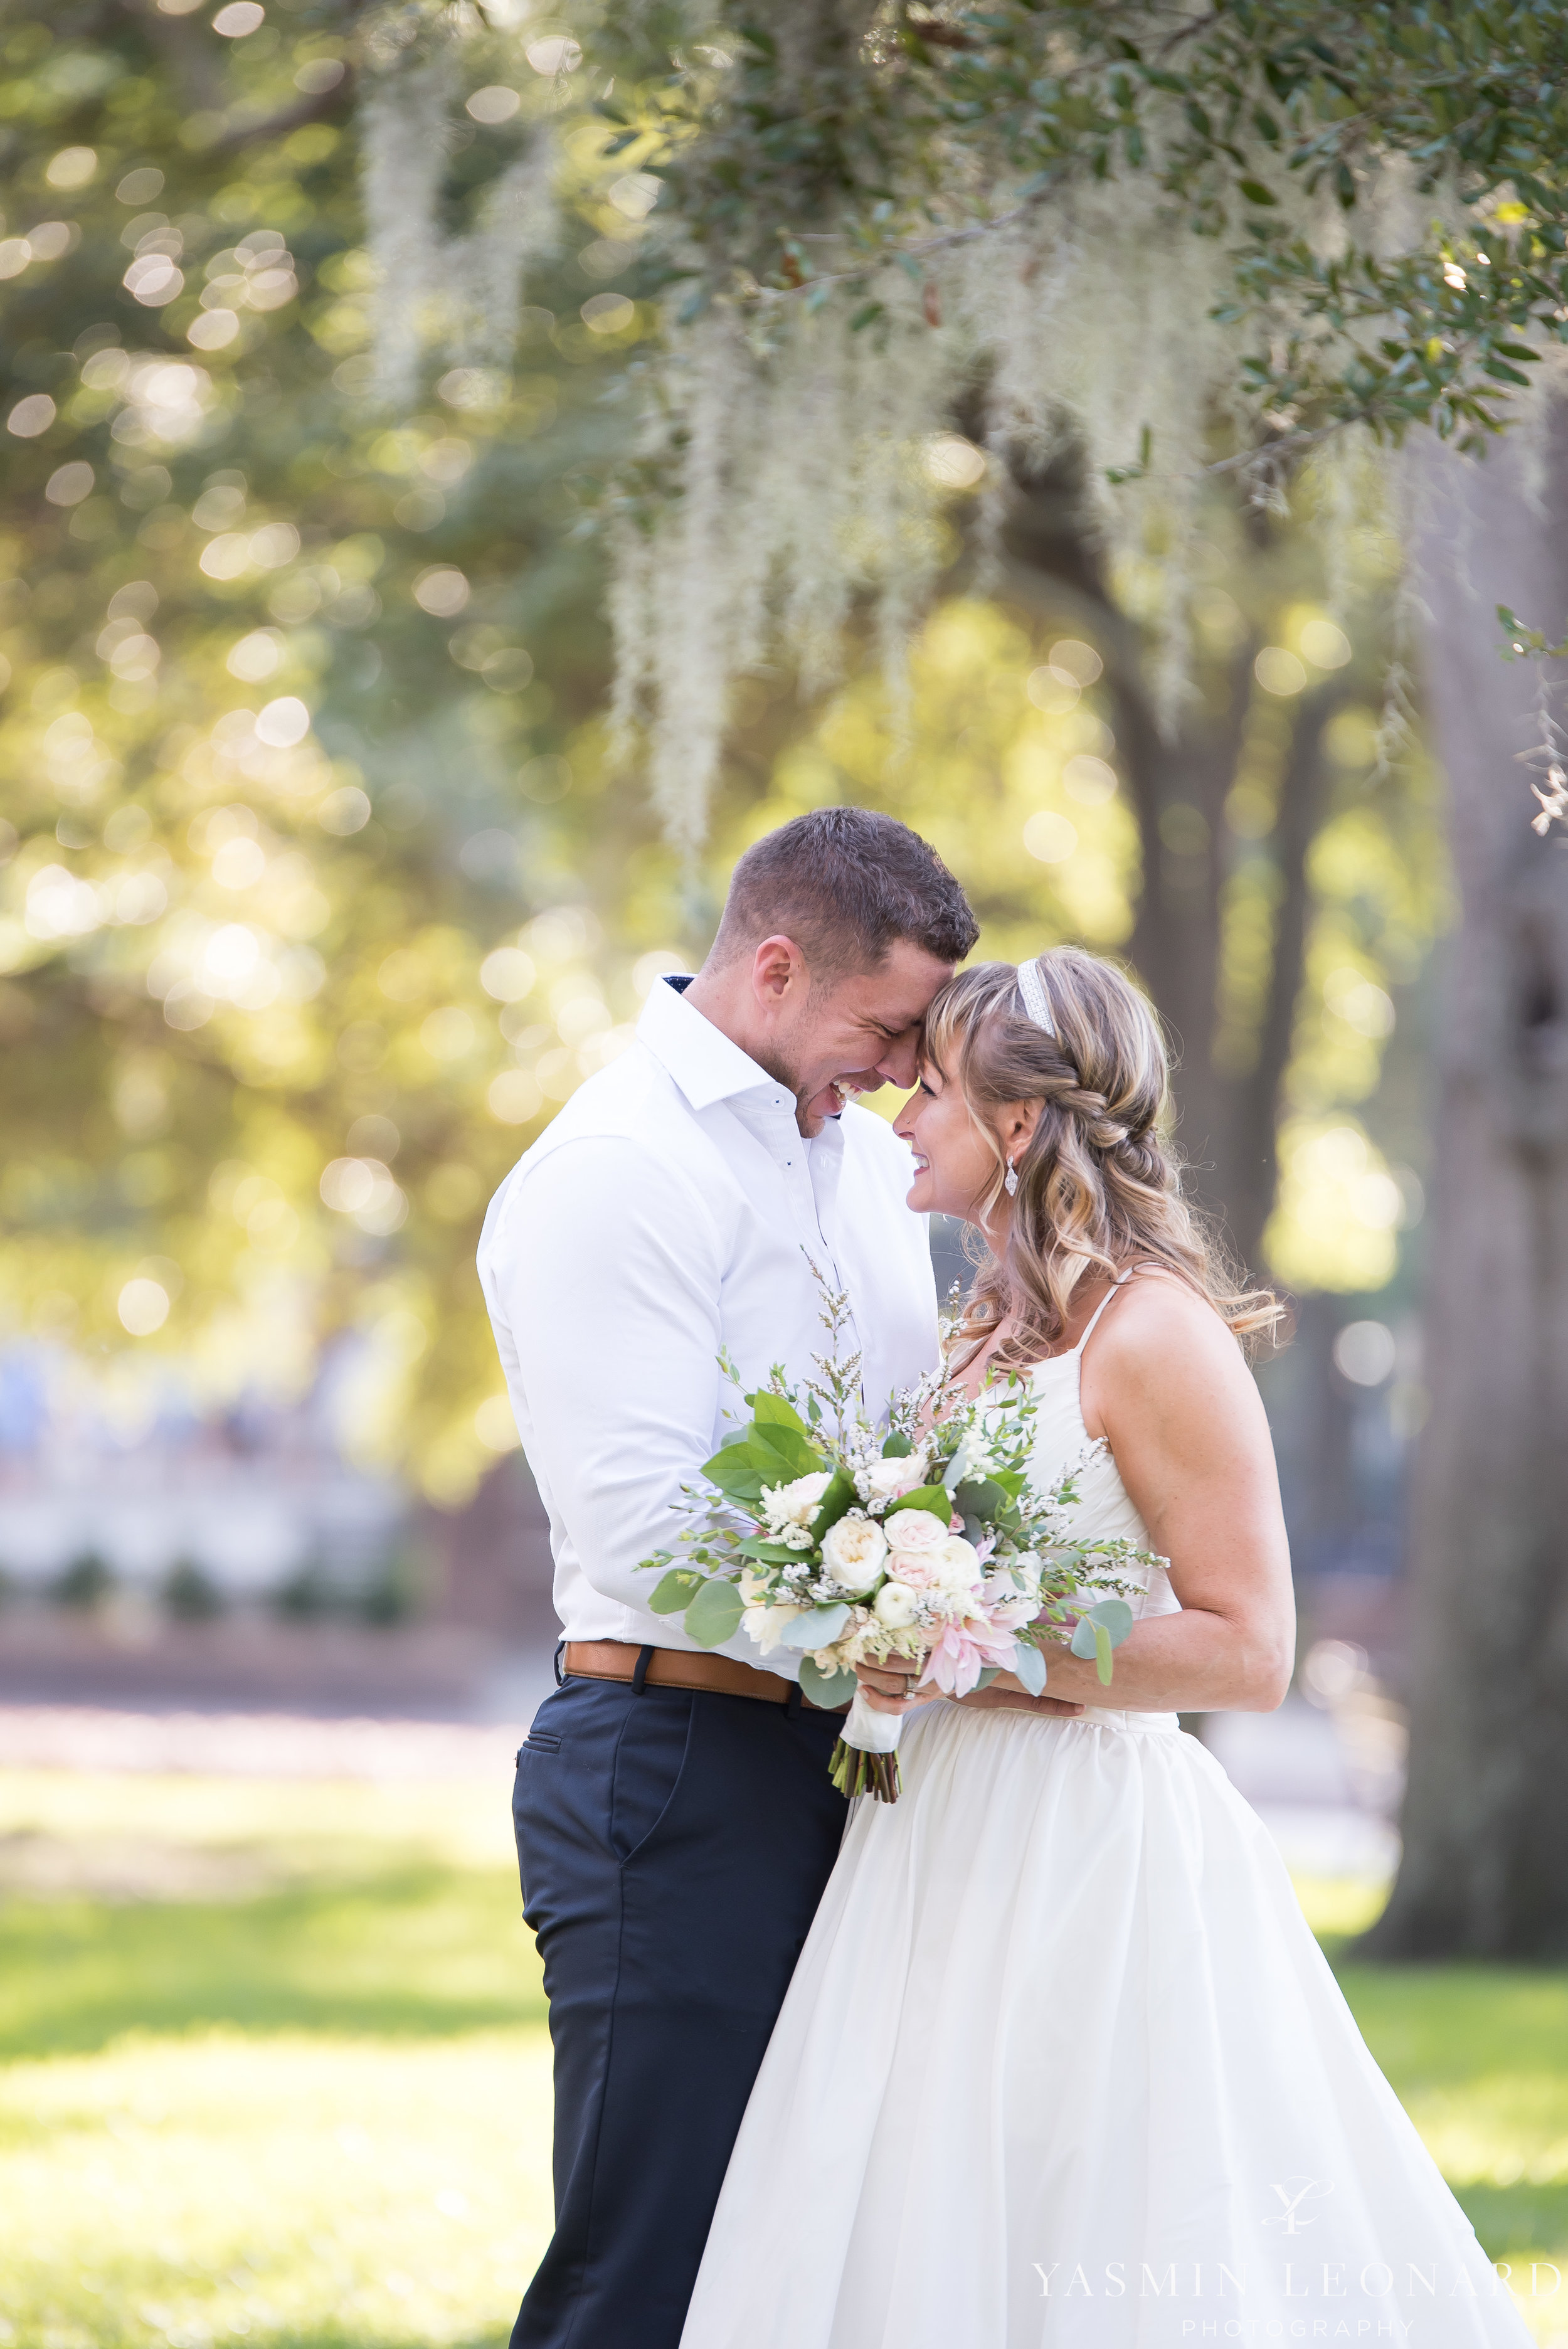 Downtown Charleston Wedding - NC Wedding Photographer -15.jpg